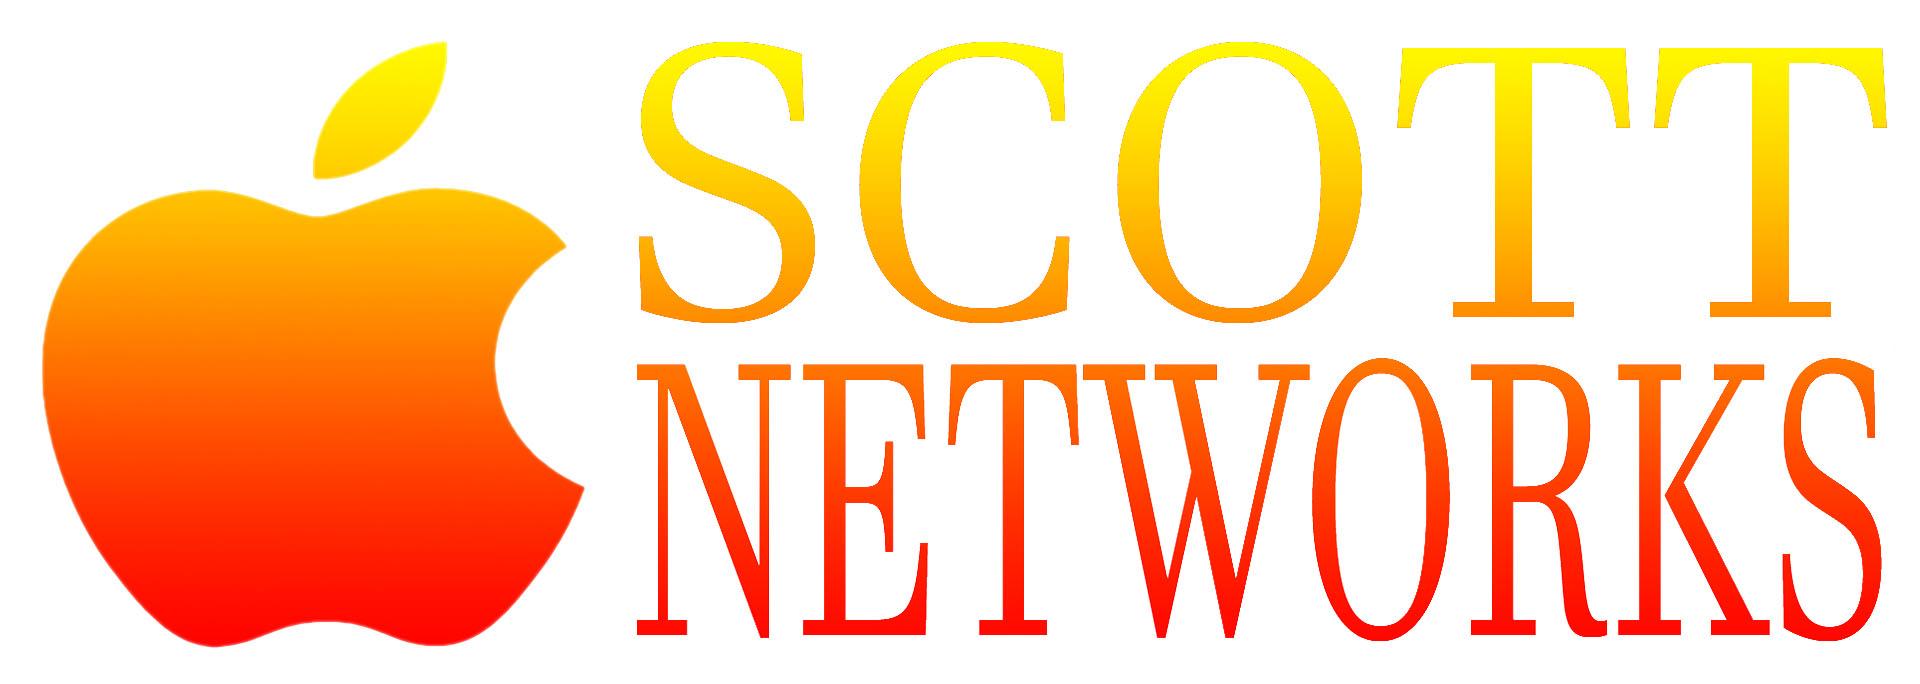 ScottNetworksLogoTransparentBackground.jpg